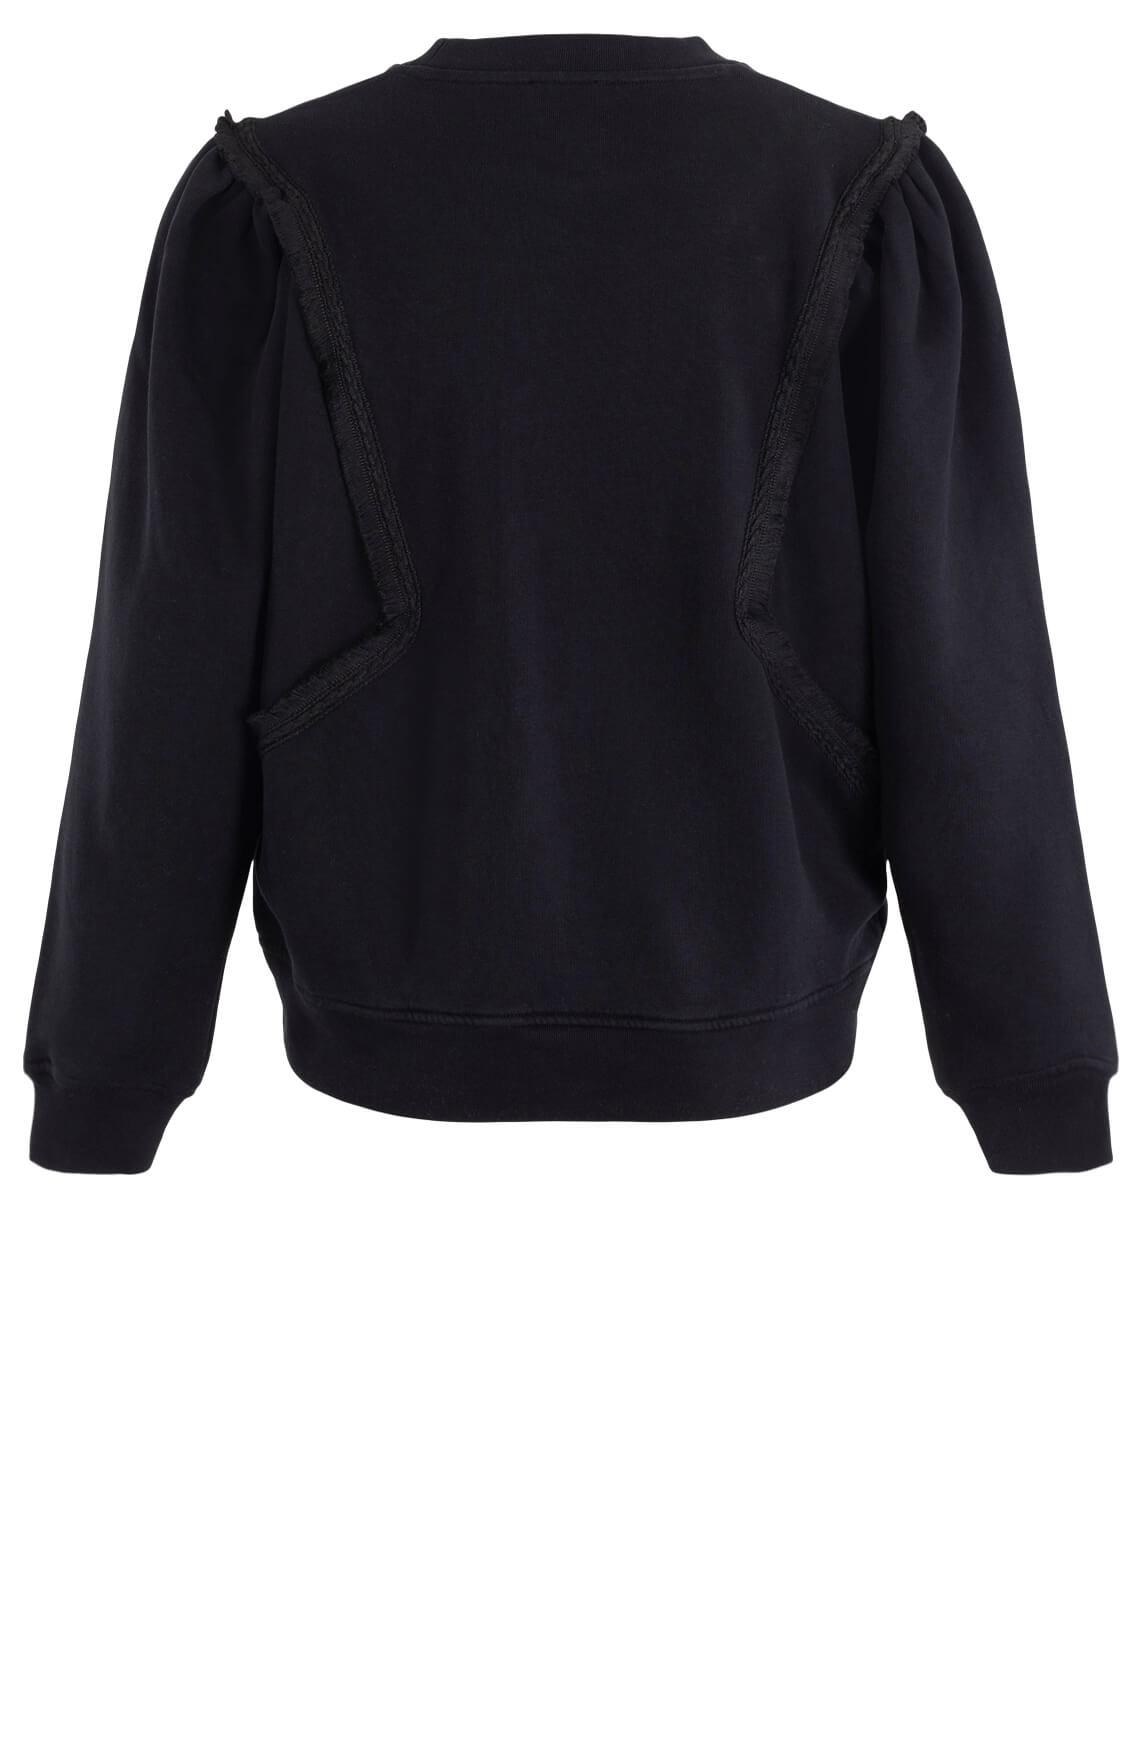 Closed Dames Sweater met gerafeld detail Zwart